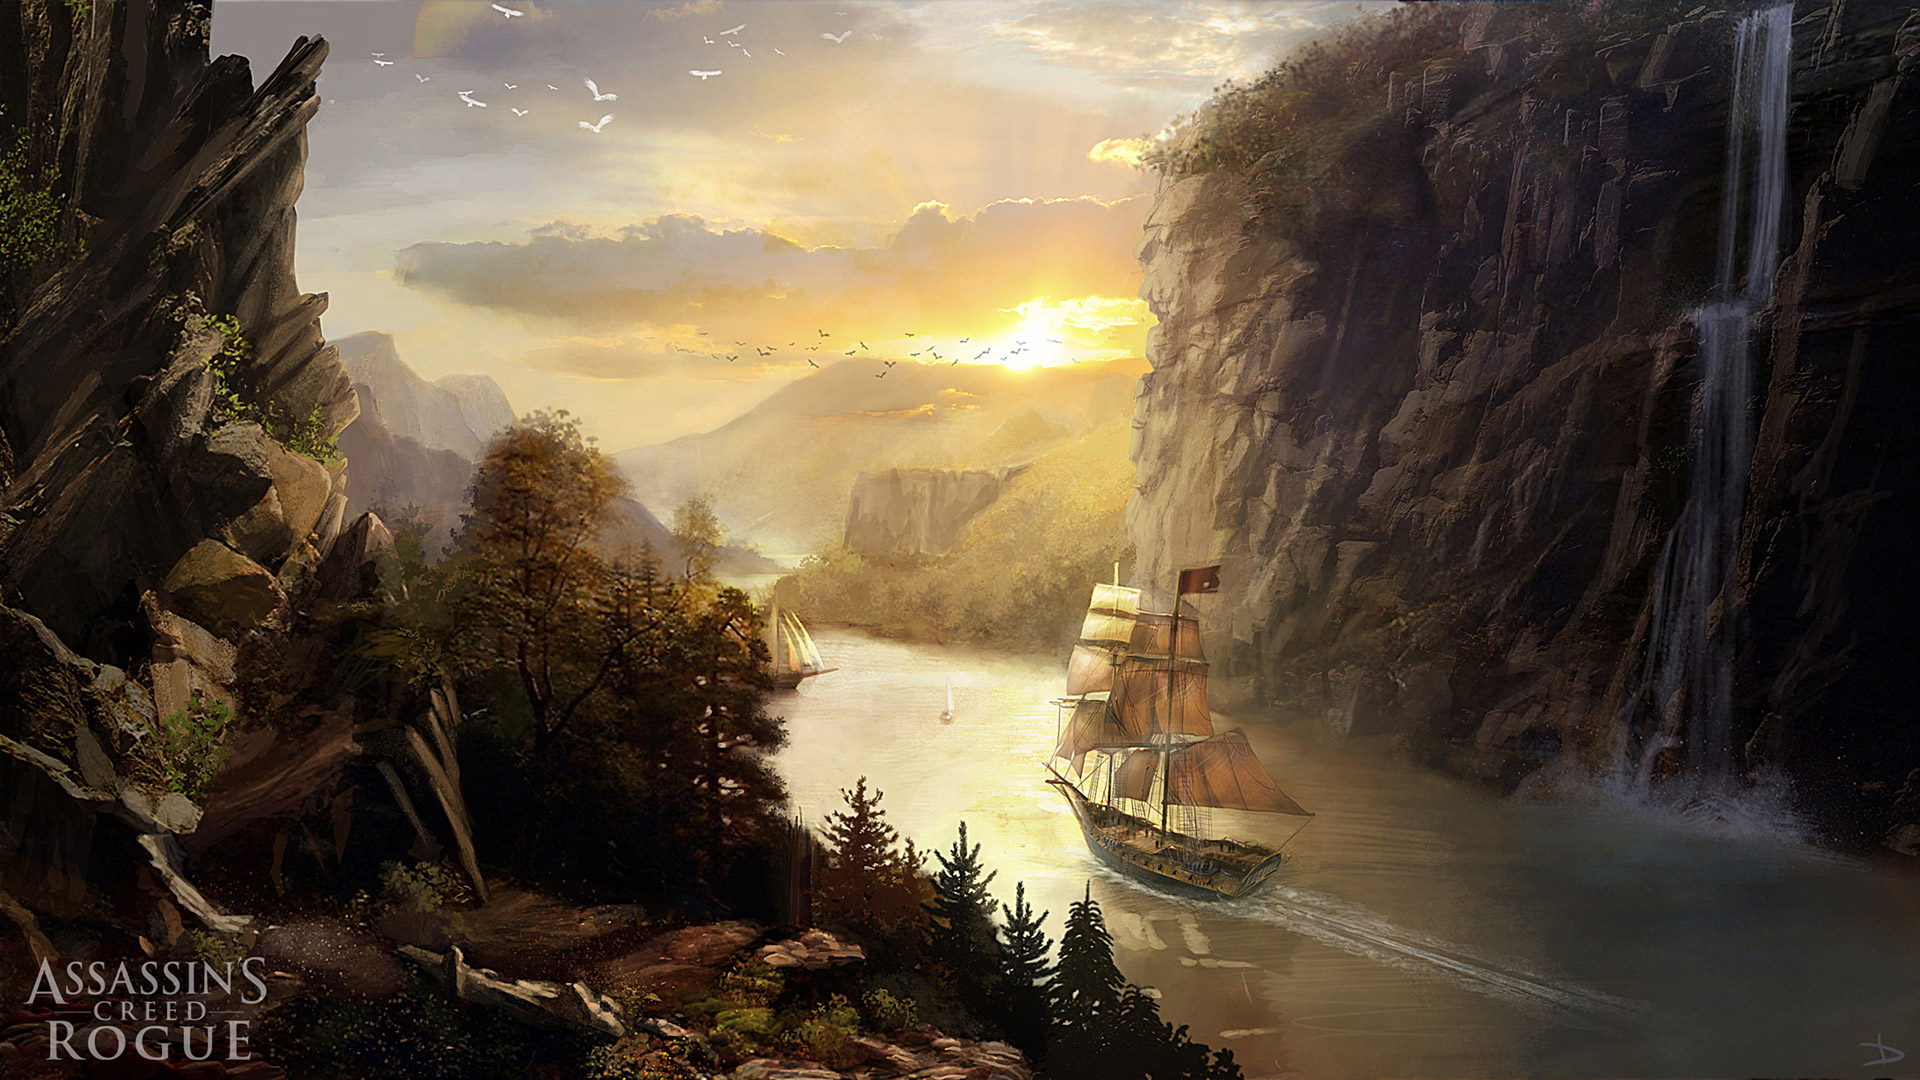 Assassin's Creed Rogue Wallpaper 1080p - WallpaperSafari